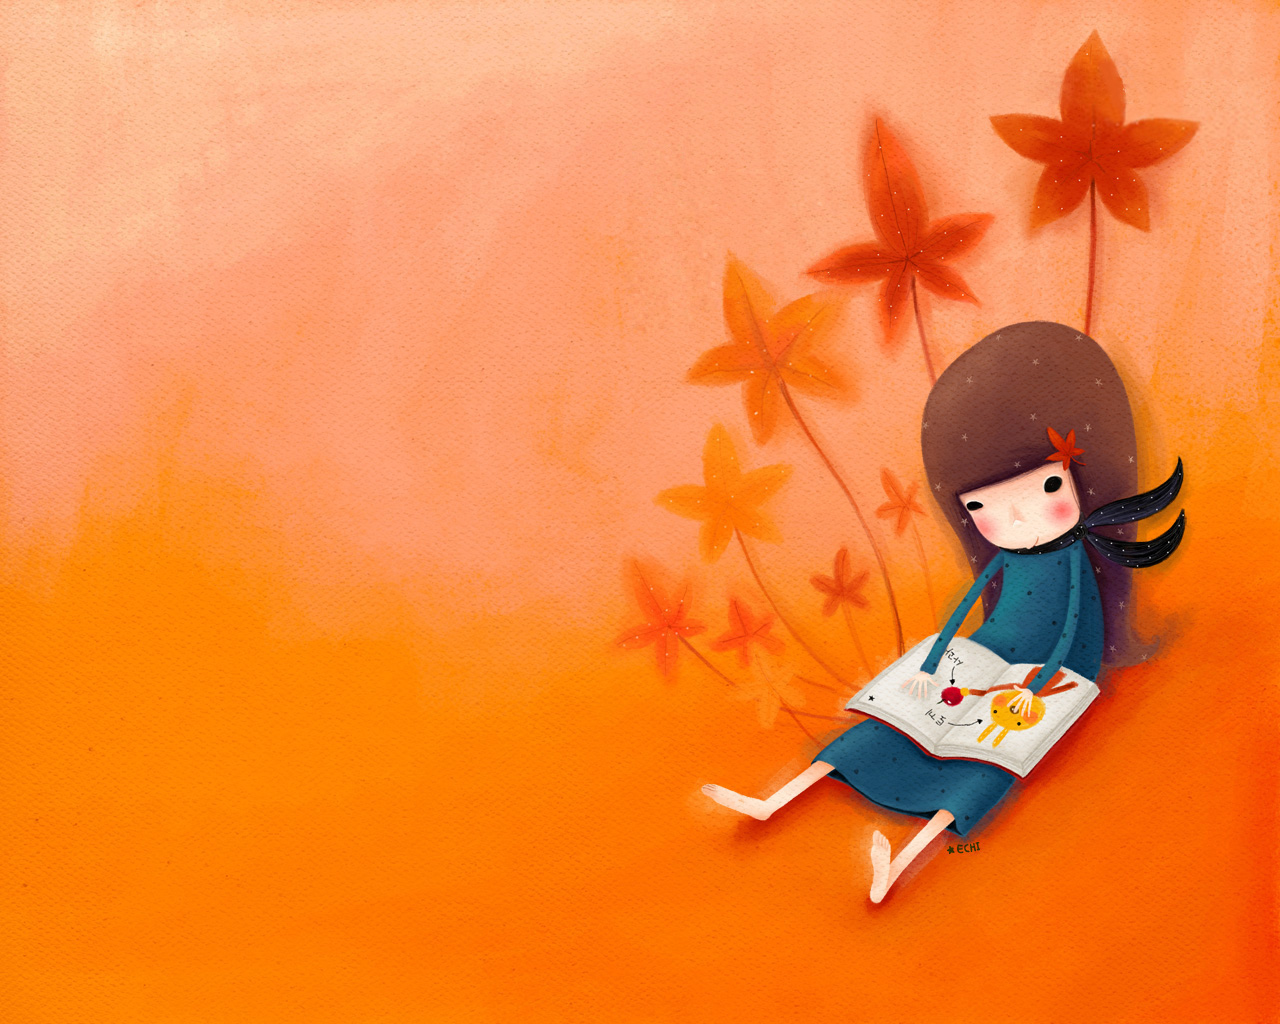 Bahasa Dan Sastra Kita November 2015